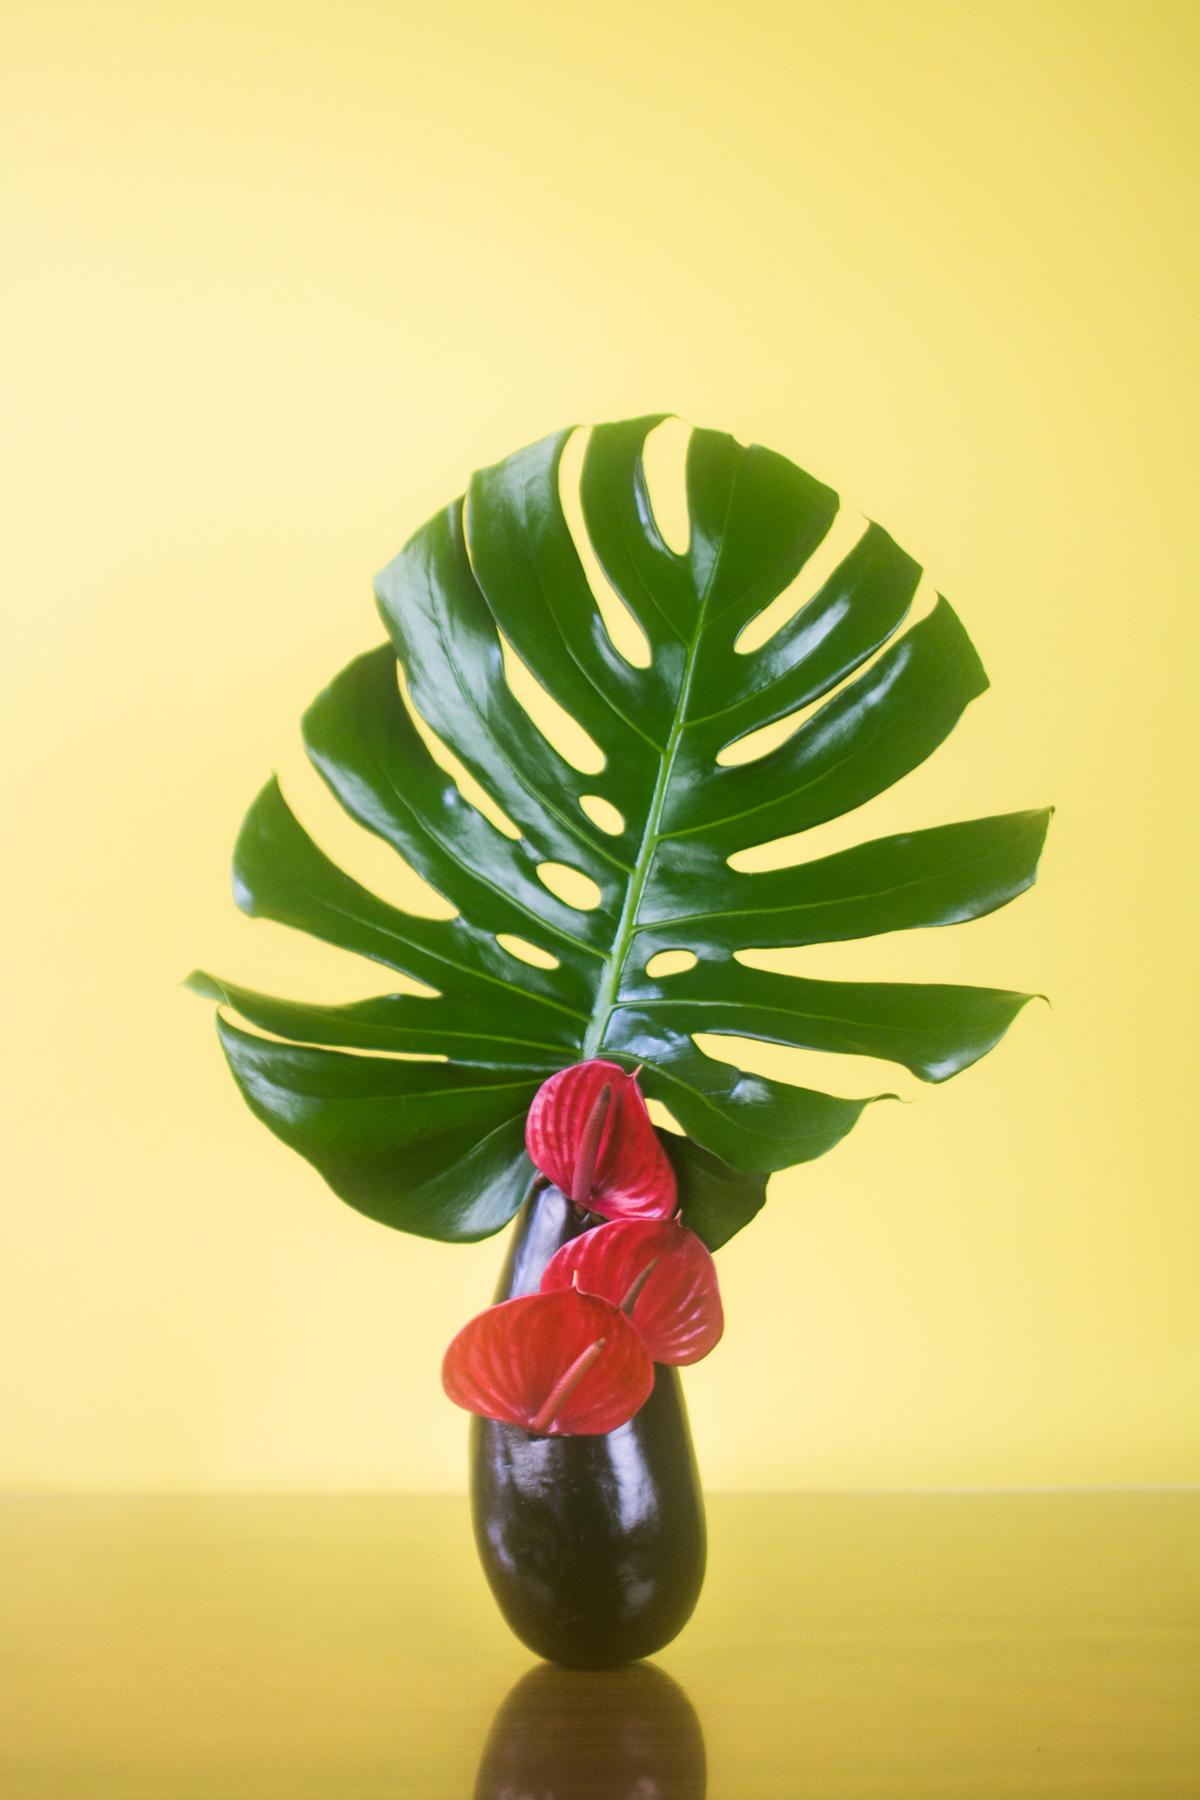 caro-flowers-edit-.jpg